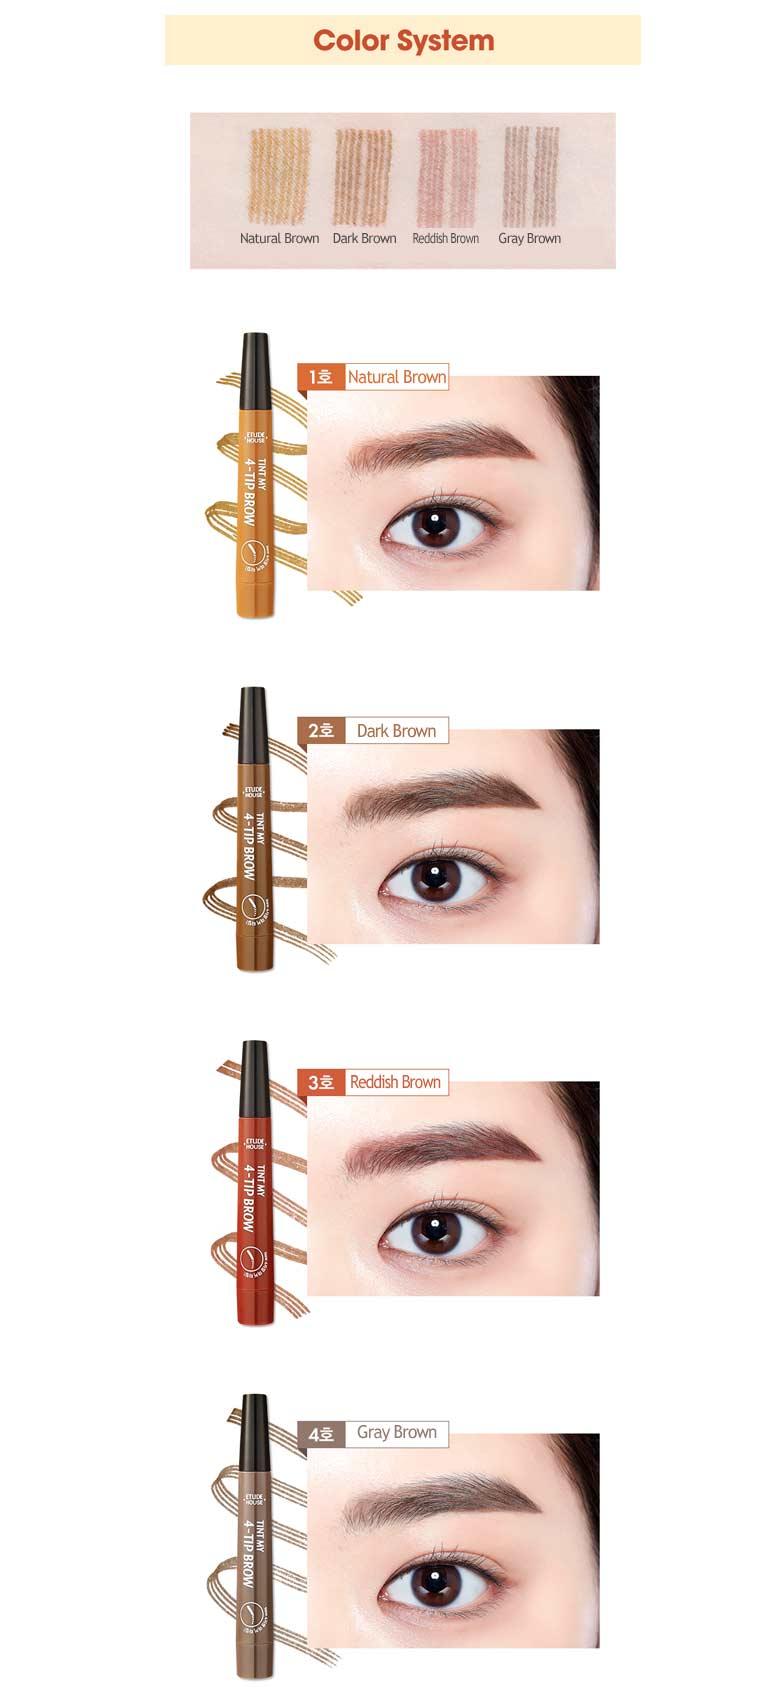 Beauty Box Korea Etude House Tint My 4 Tip Brow 2g Best Price Color